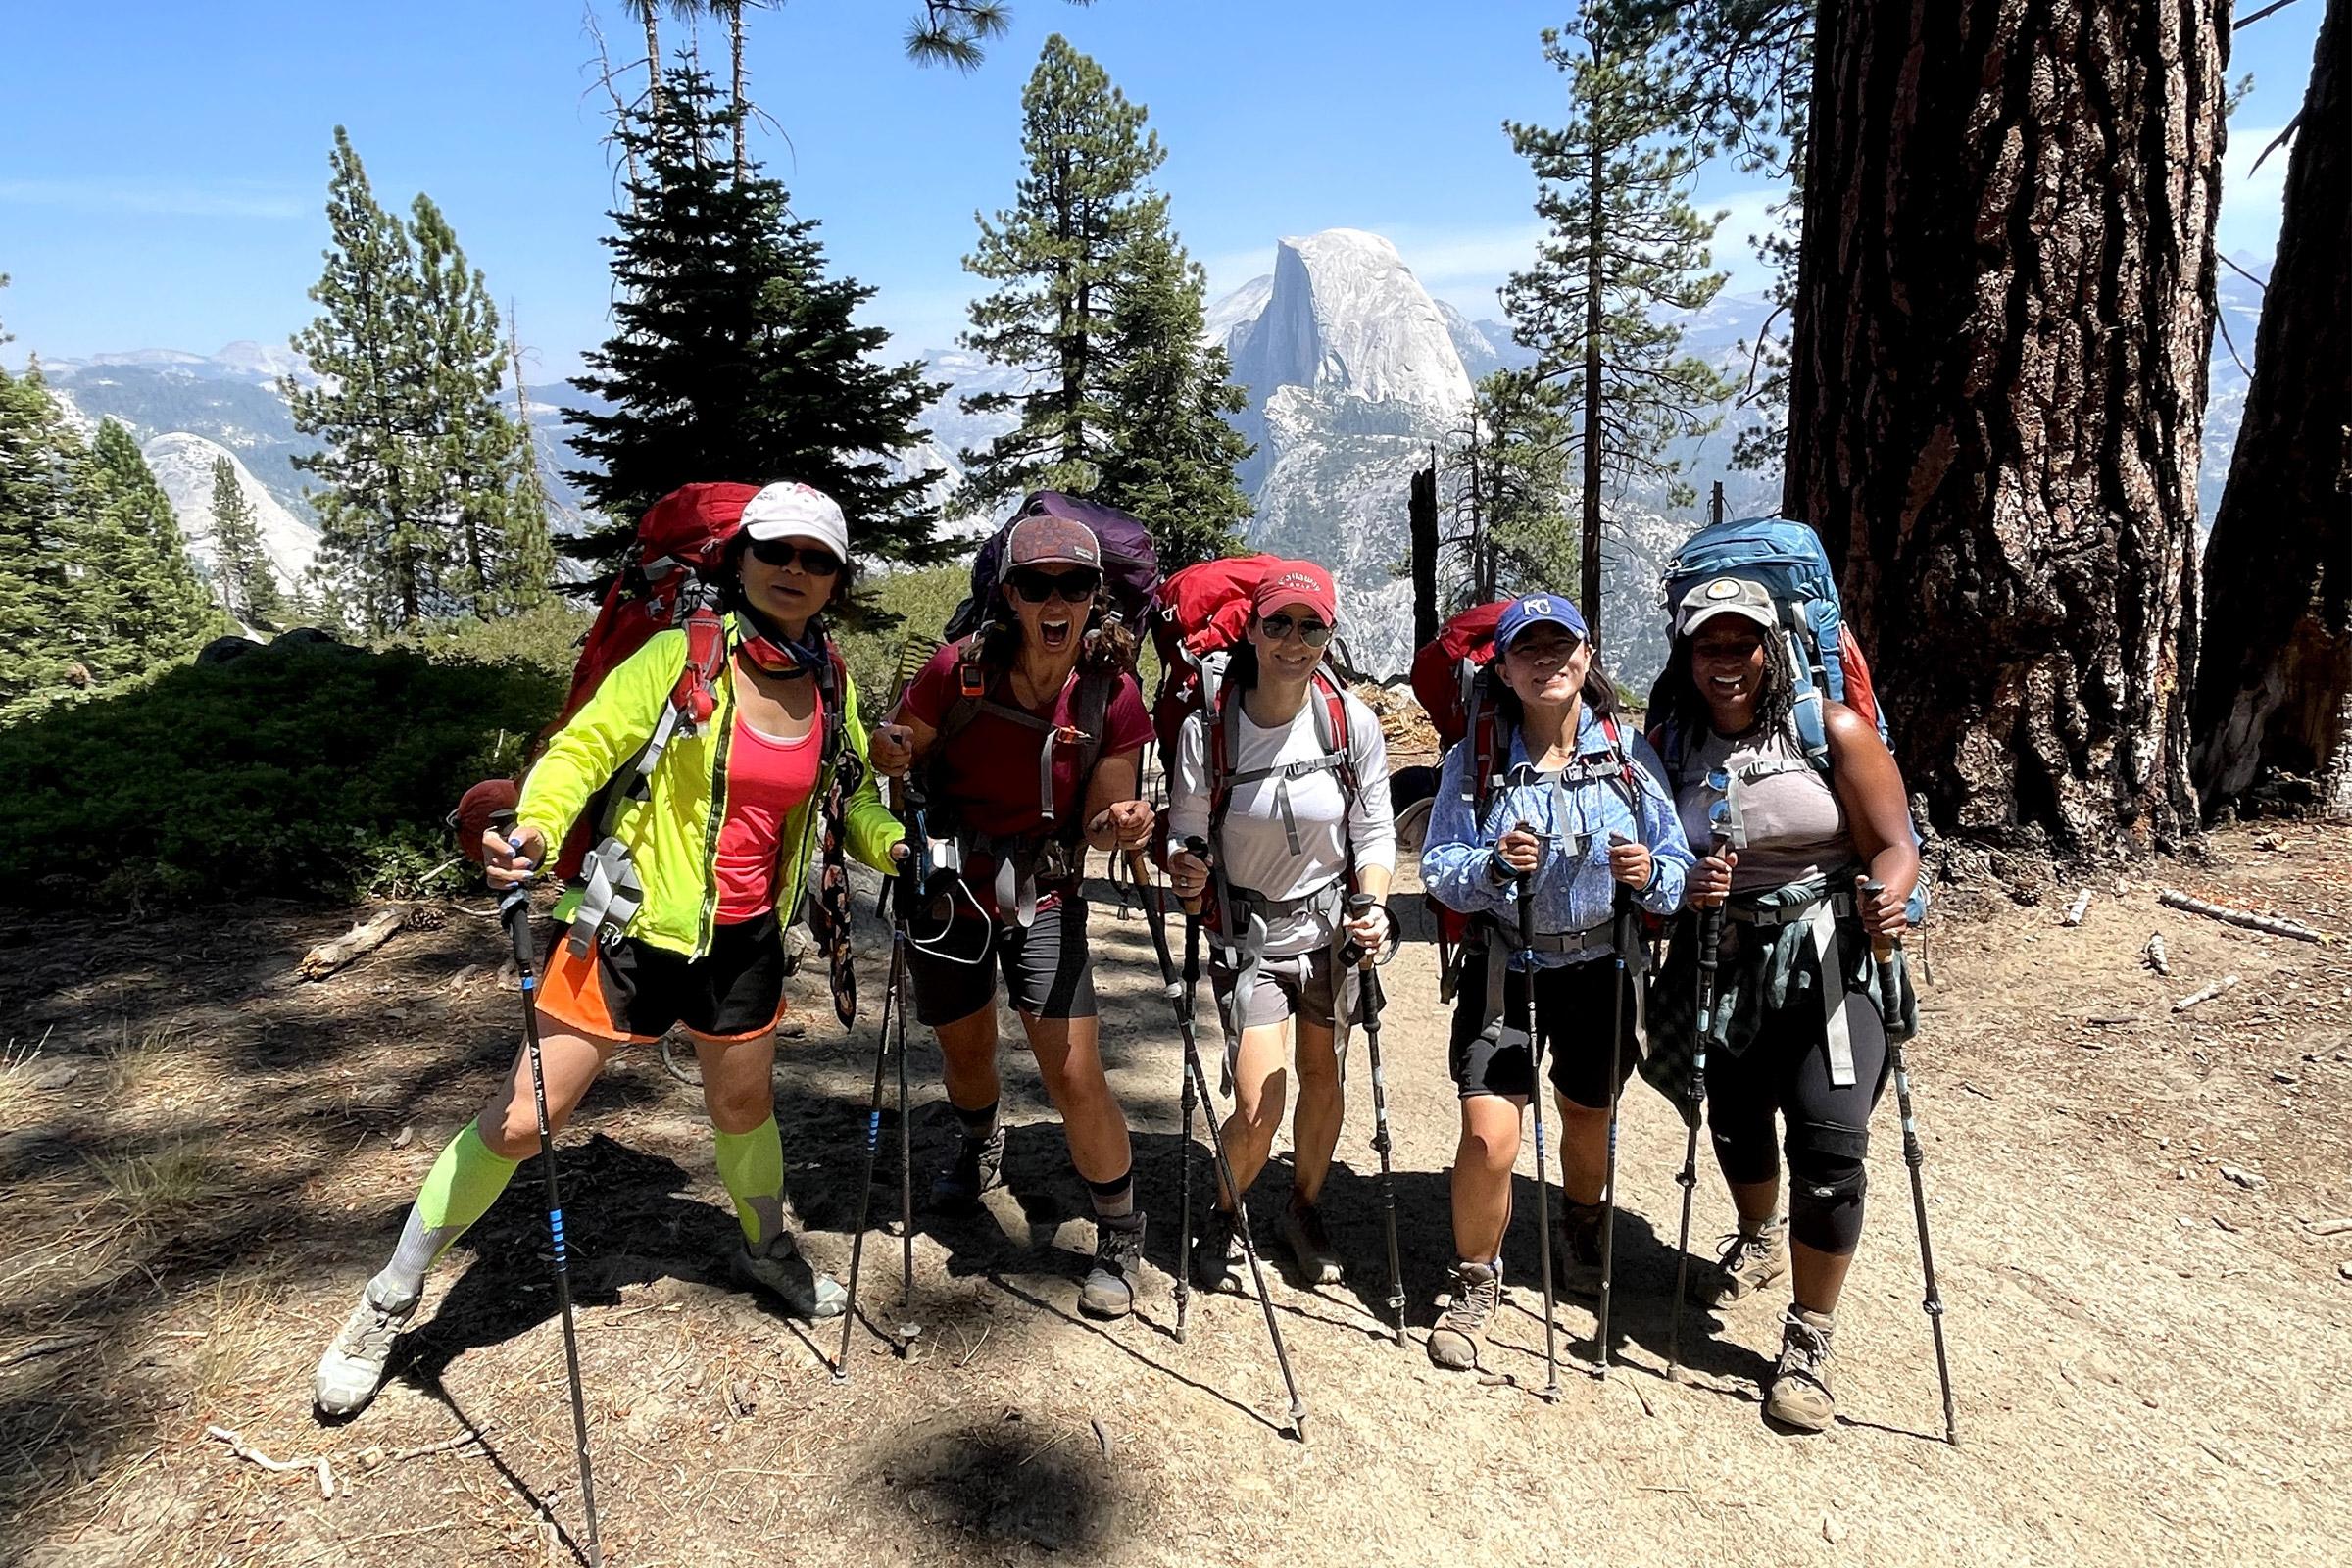 types of trekking poles